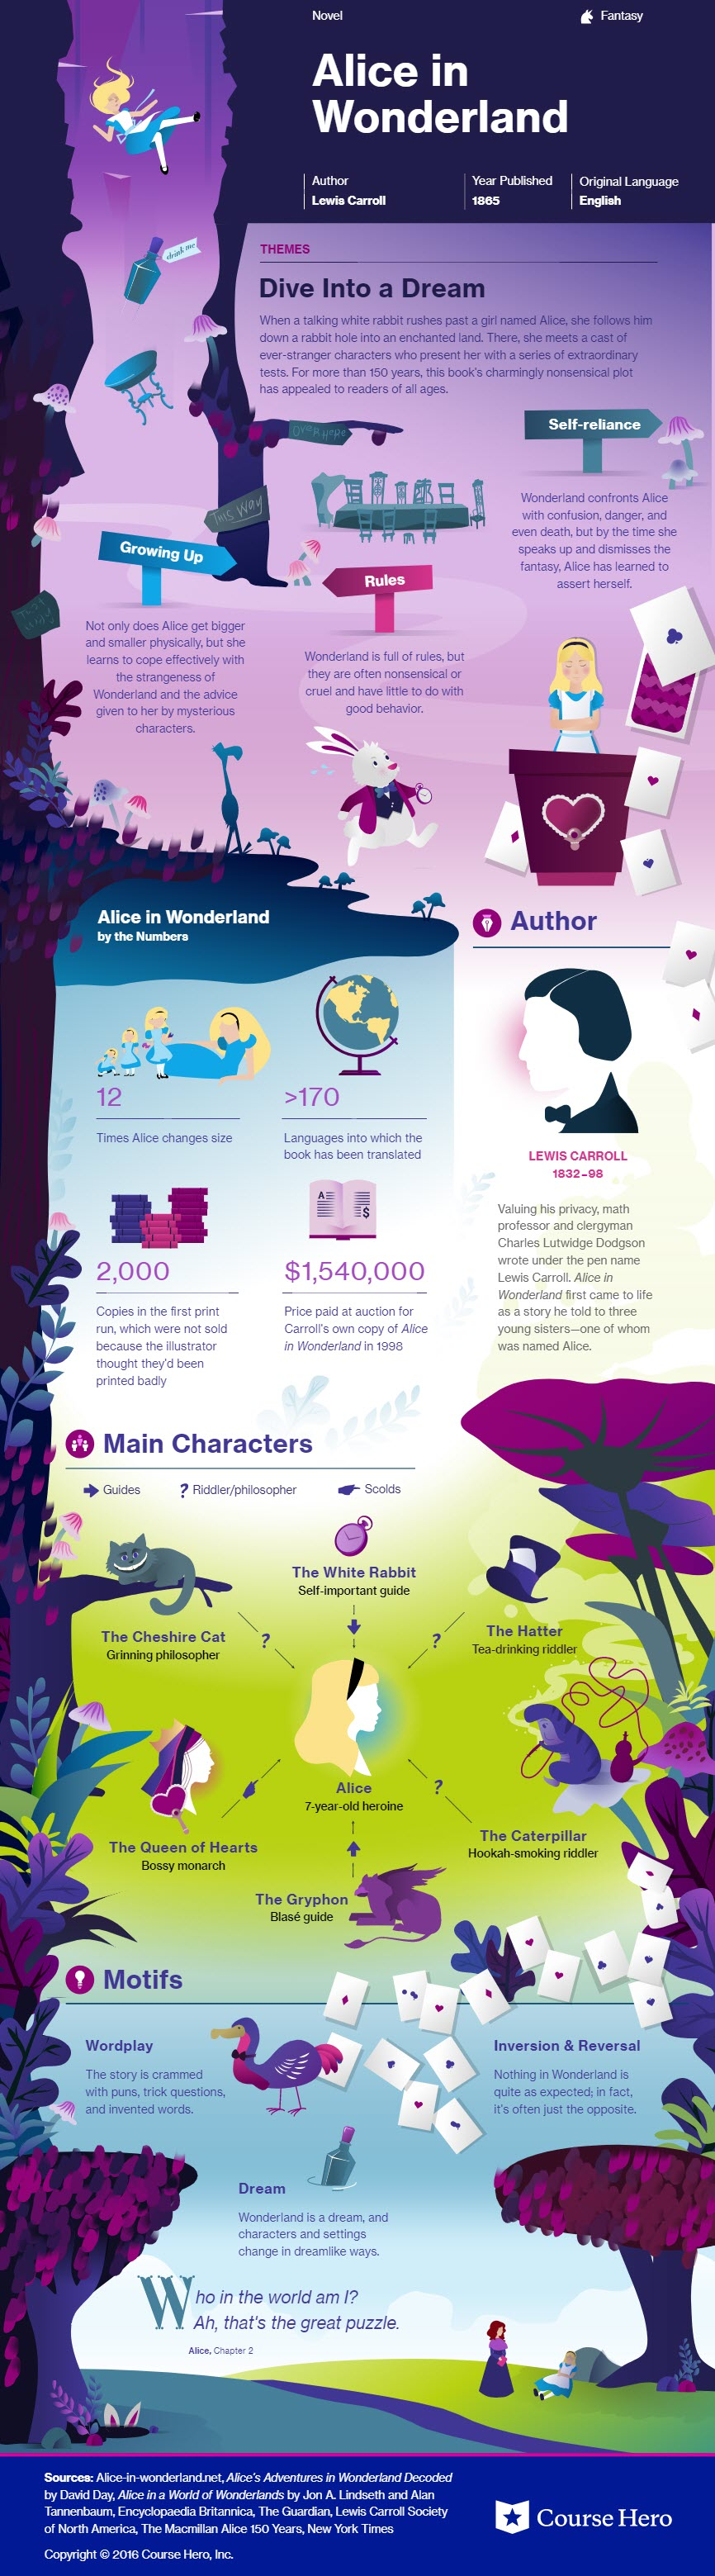 Alice in Wonderland Infographic - Course Hero